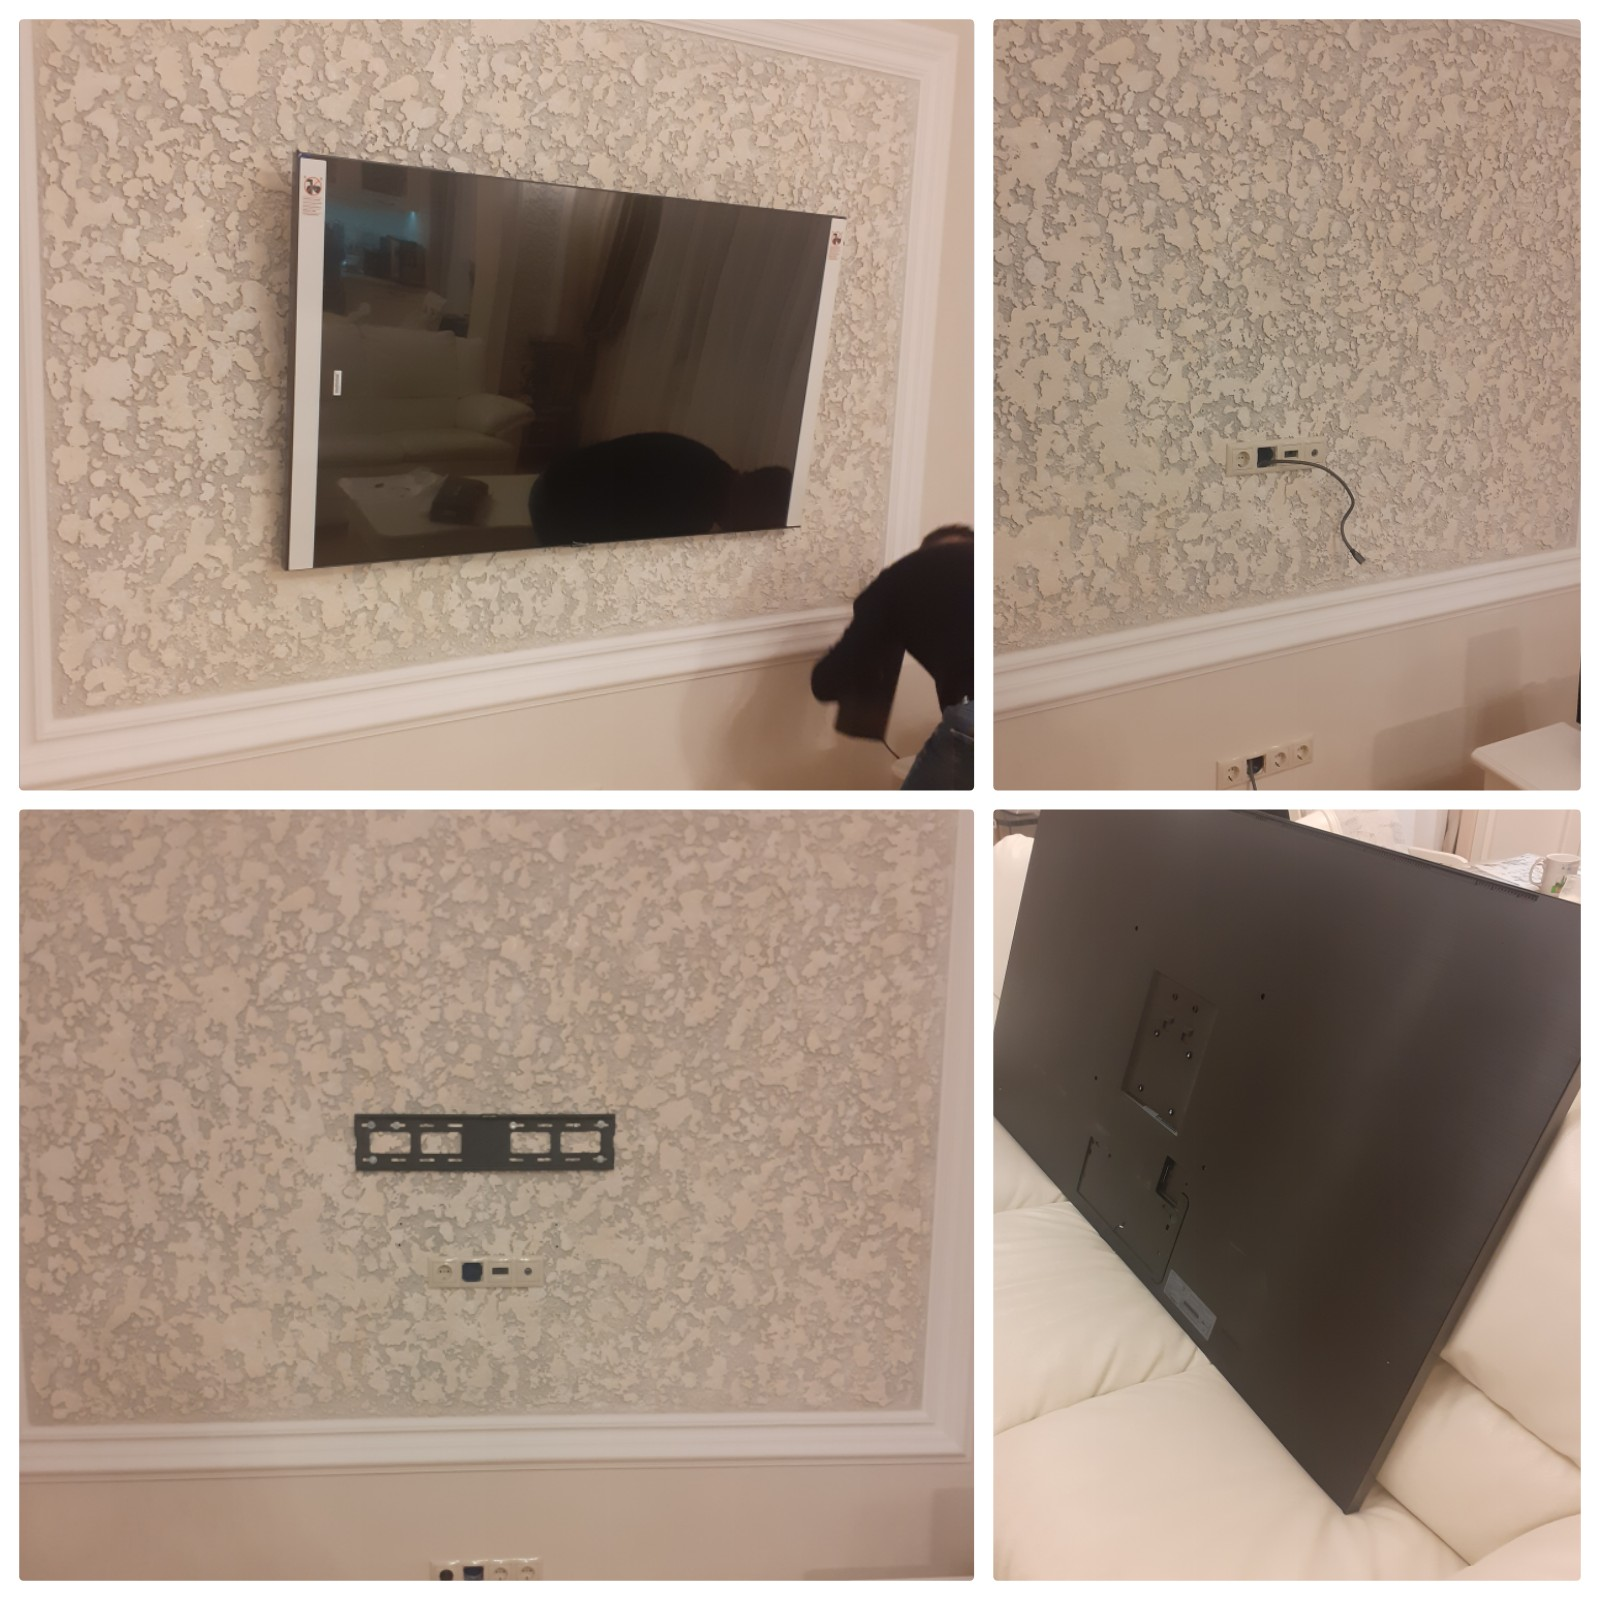 Фото 65 дюймов  телевизор Samsung  на стену из пеноблока